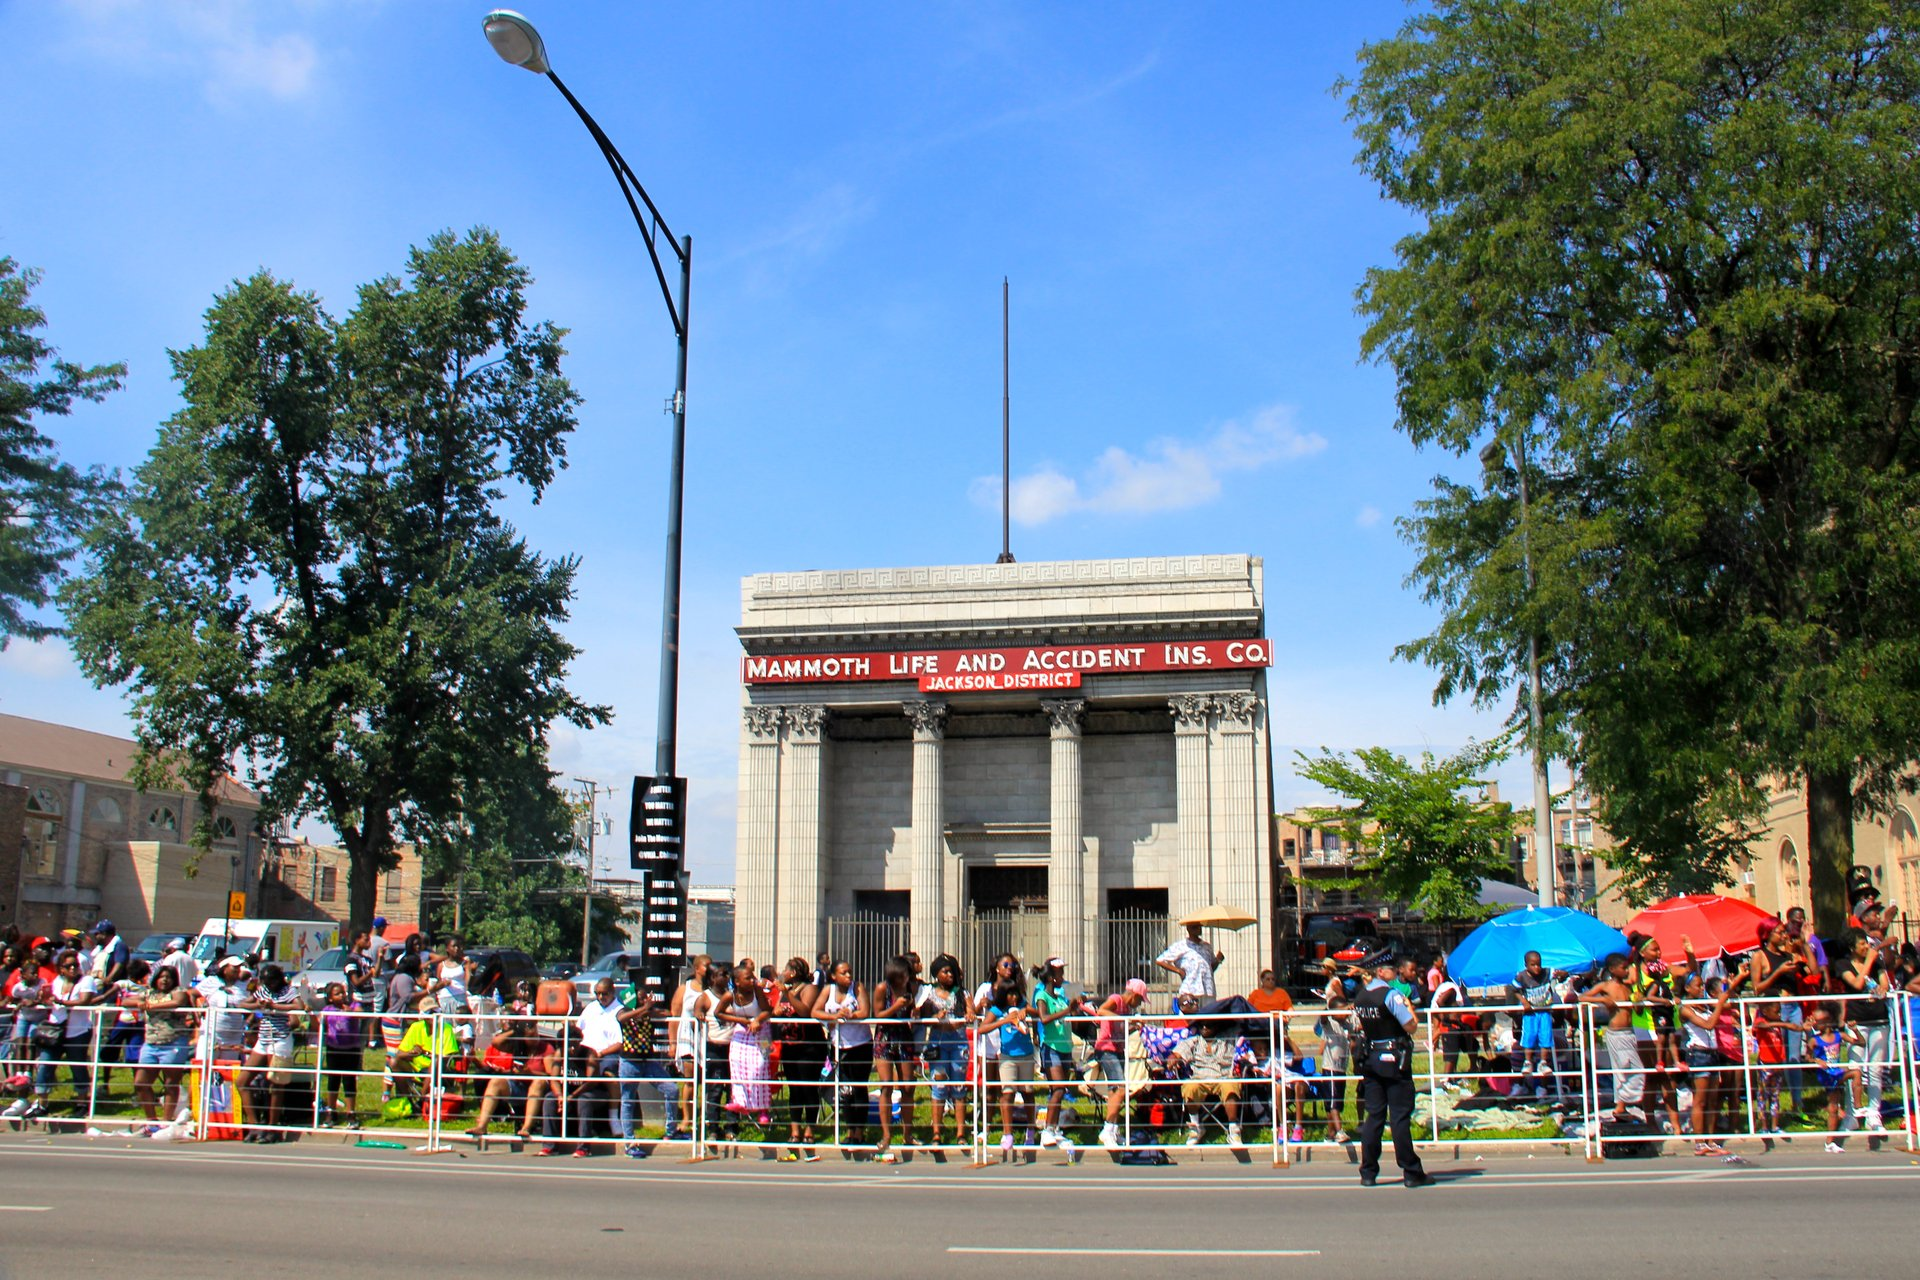 Bud Billiken Parade in Chicago - Best Season 2020